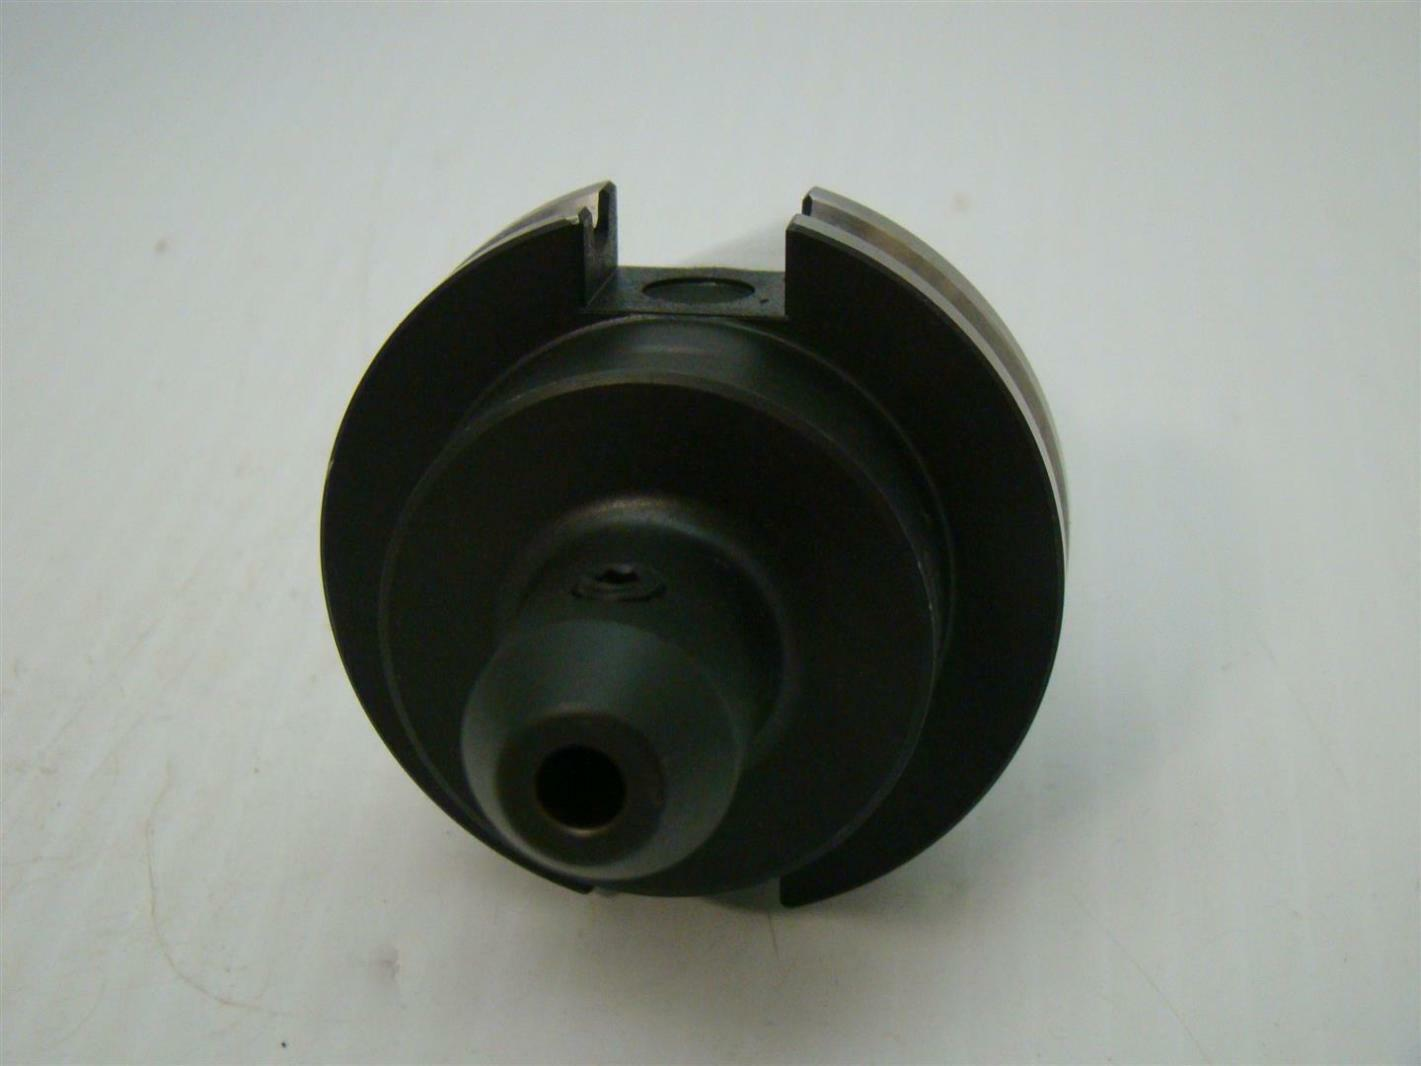 Lyndex 40 Taper CNC Tool Holder 0612 C4006-0250